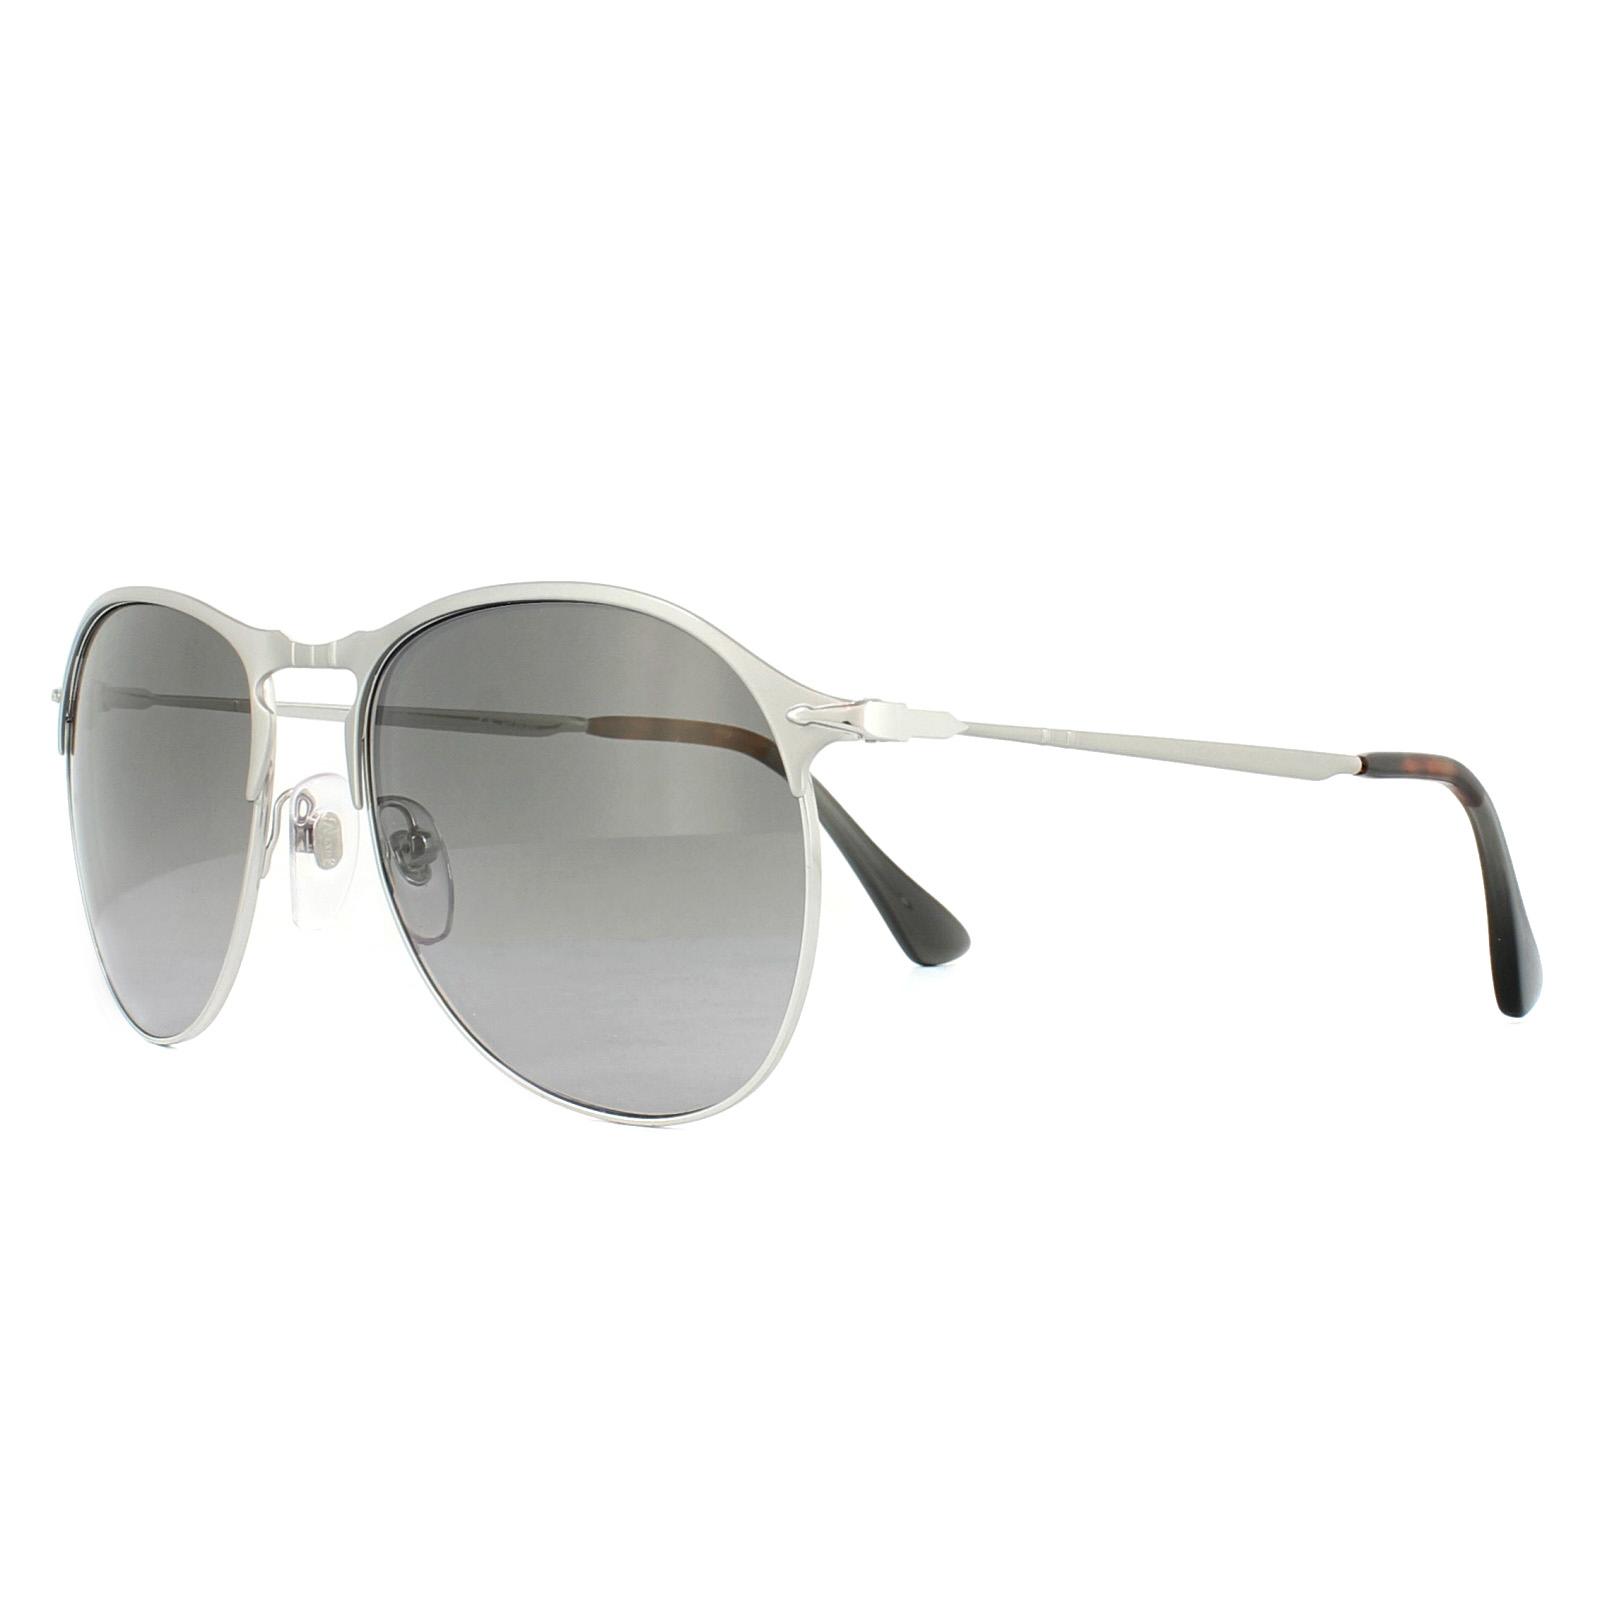 c8c57c6932b Sentinel Persol Sunglasses 7359S 1068M3 Matt Silver Green Gradient Polarized